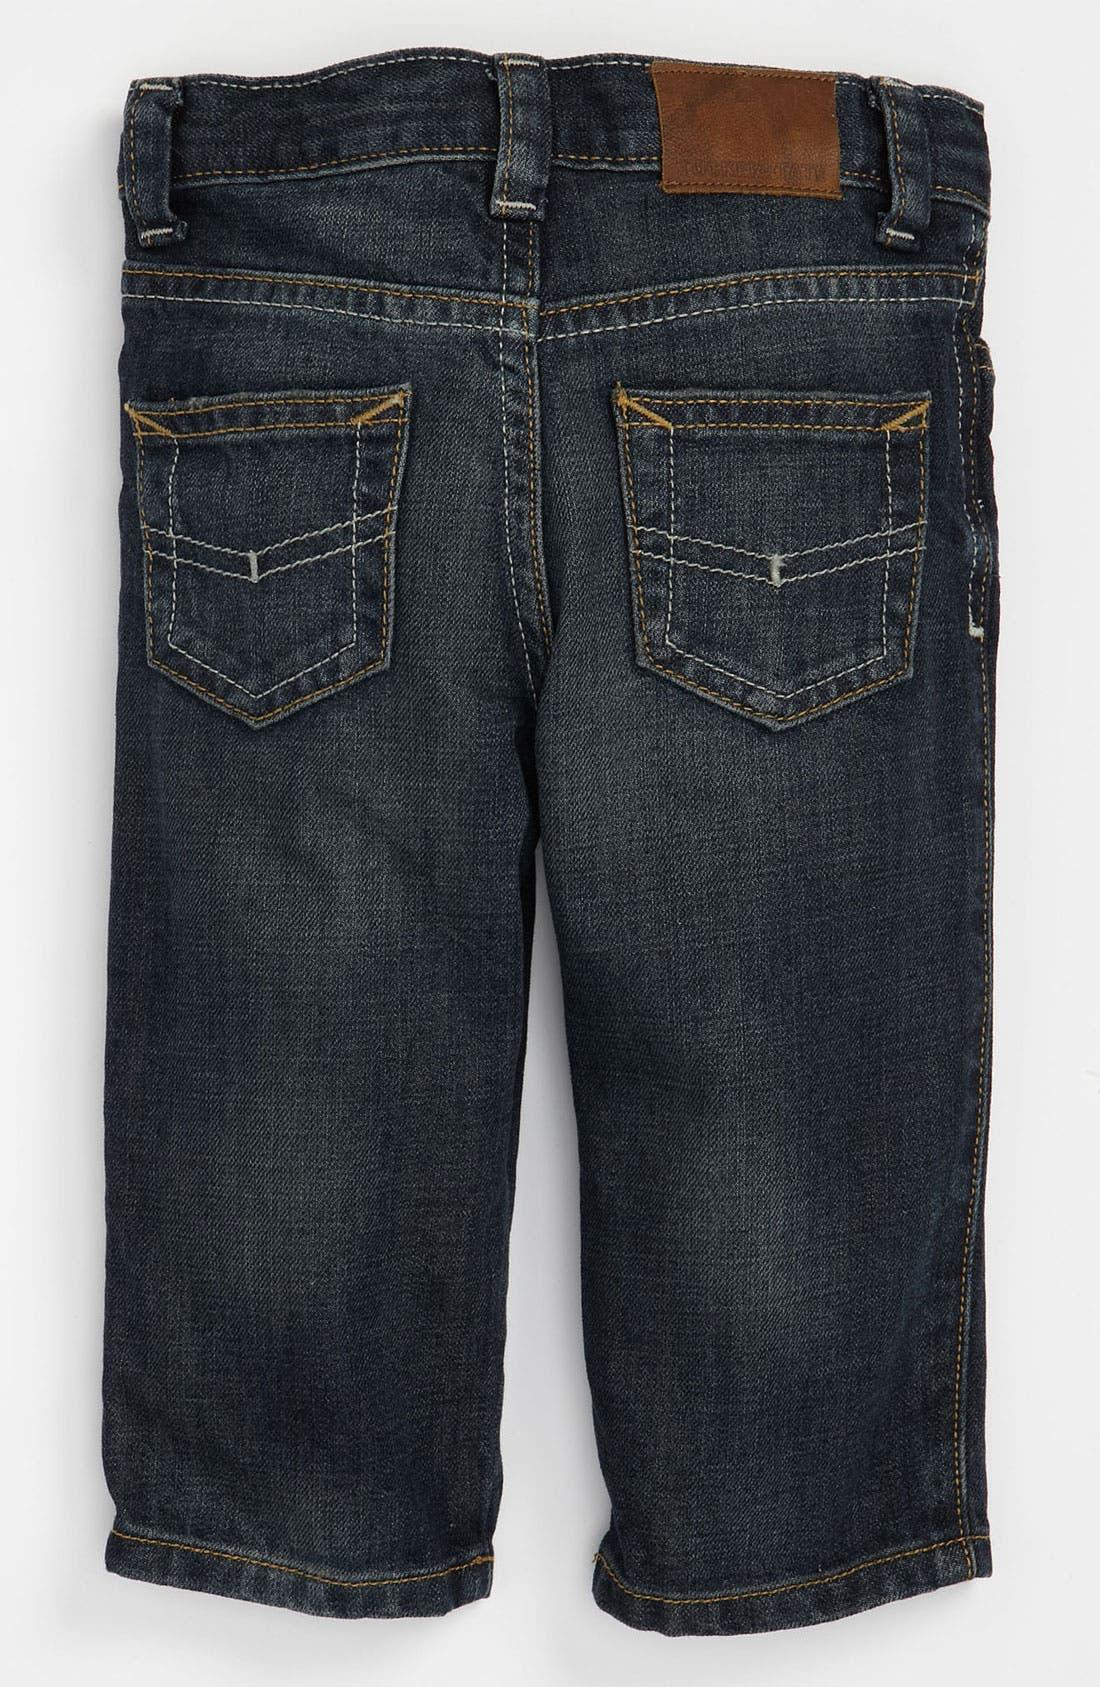 Main Image - Tucker + Tate 'Tucker' Jeans (Infant)